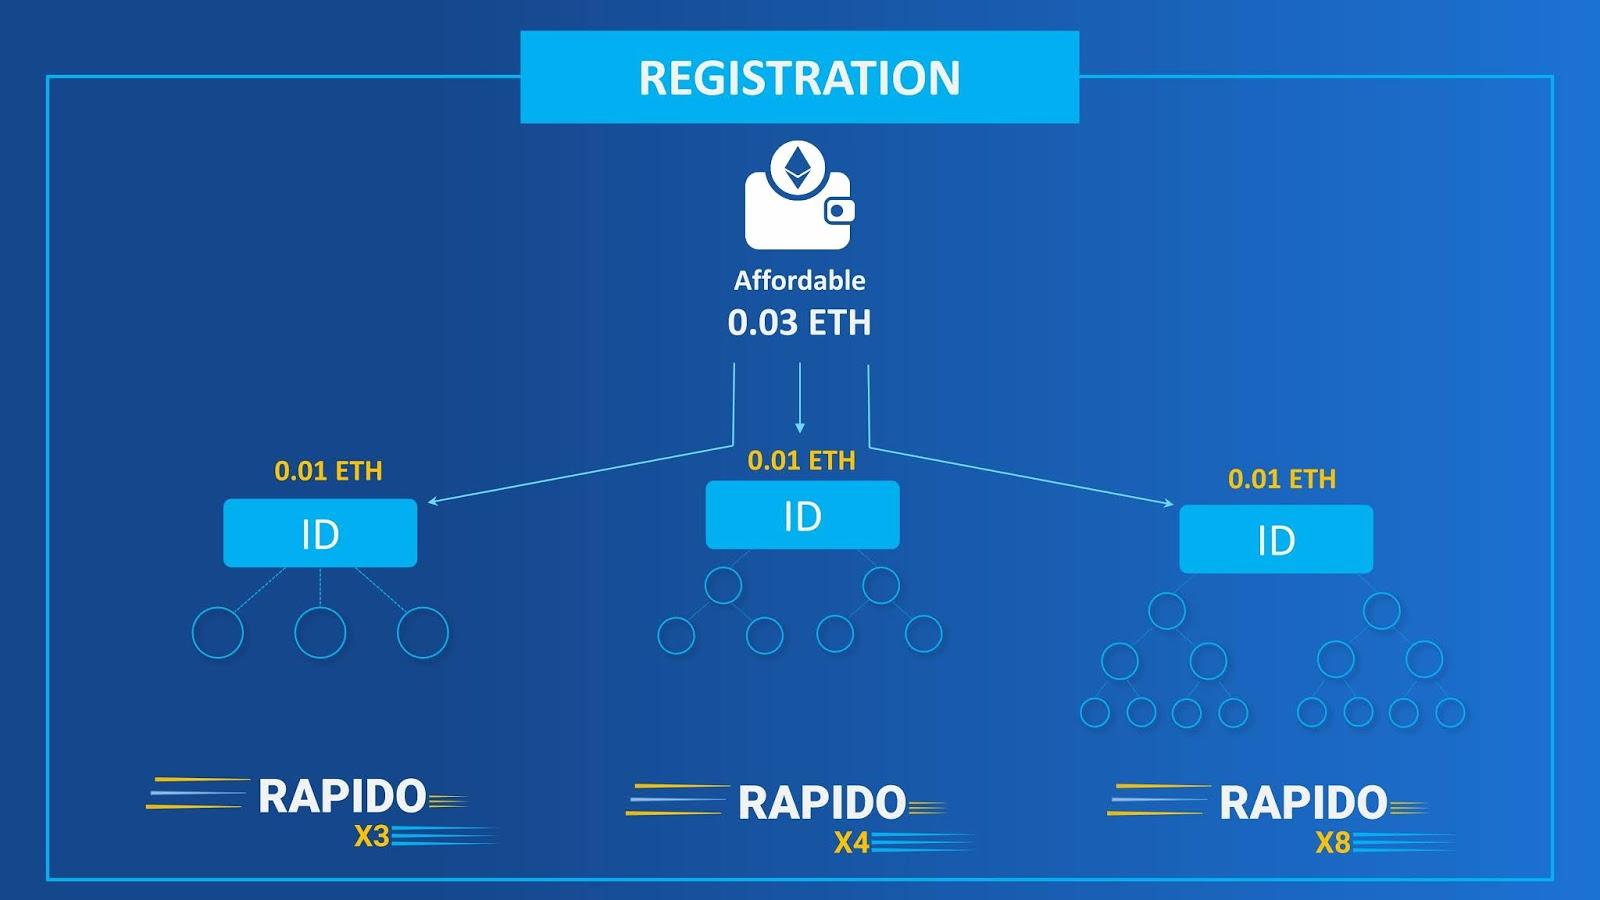 Rapido registration process and eth